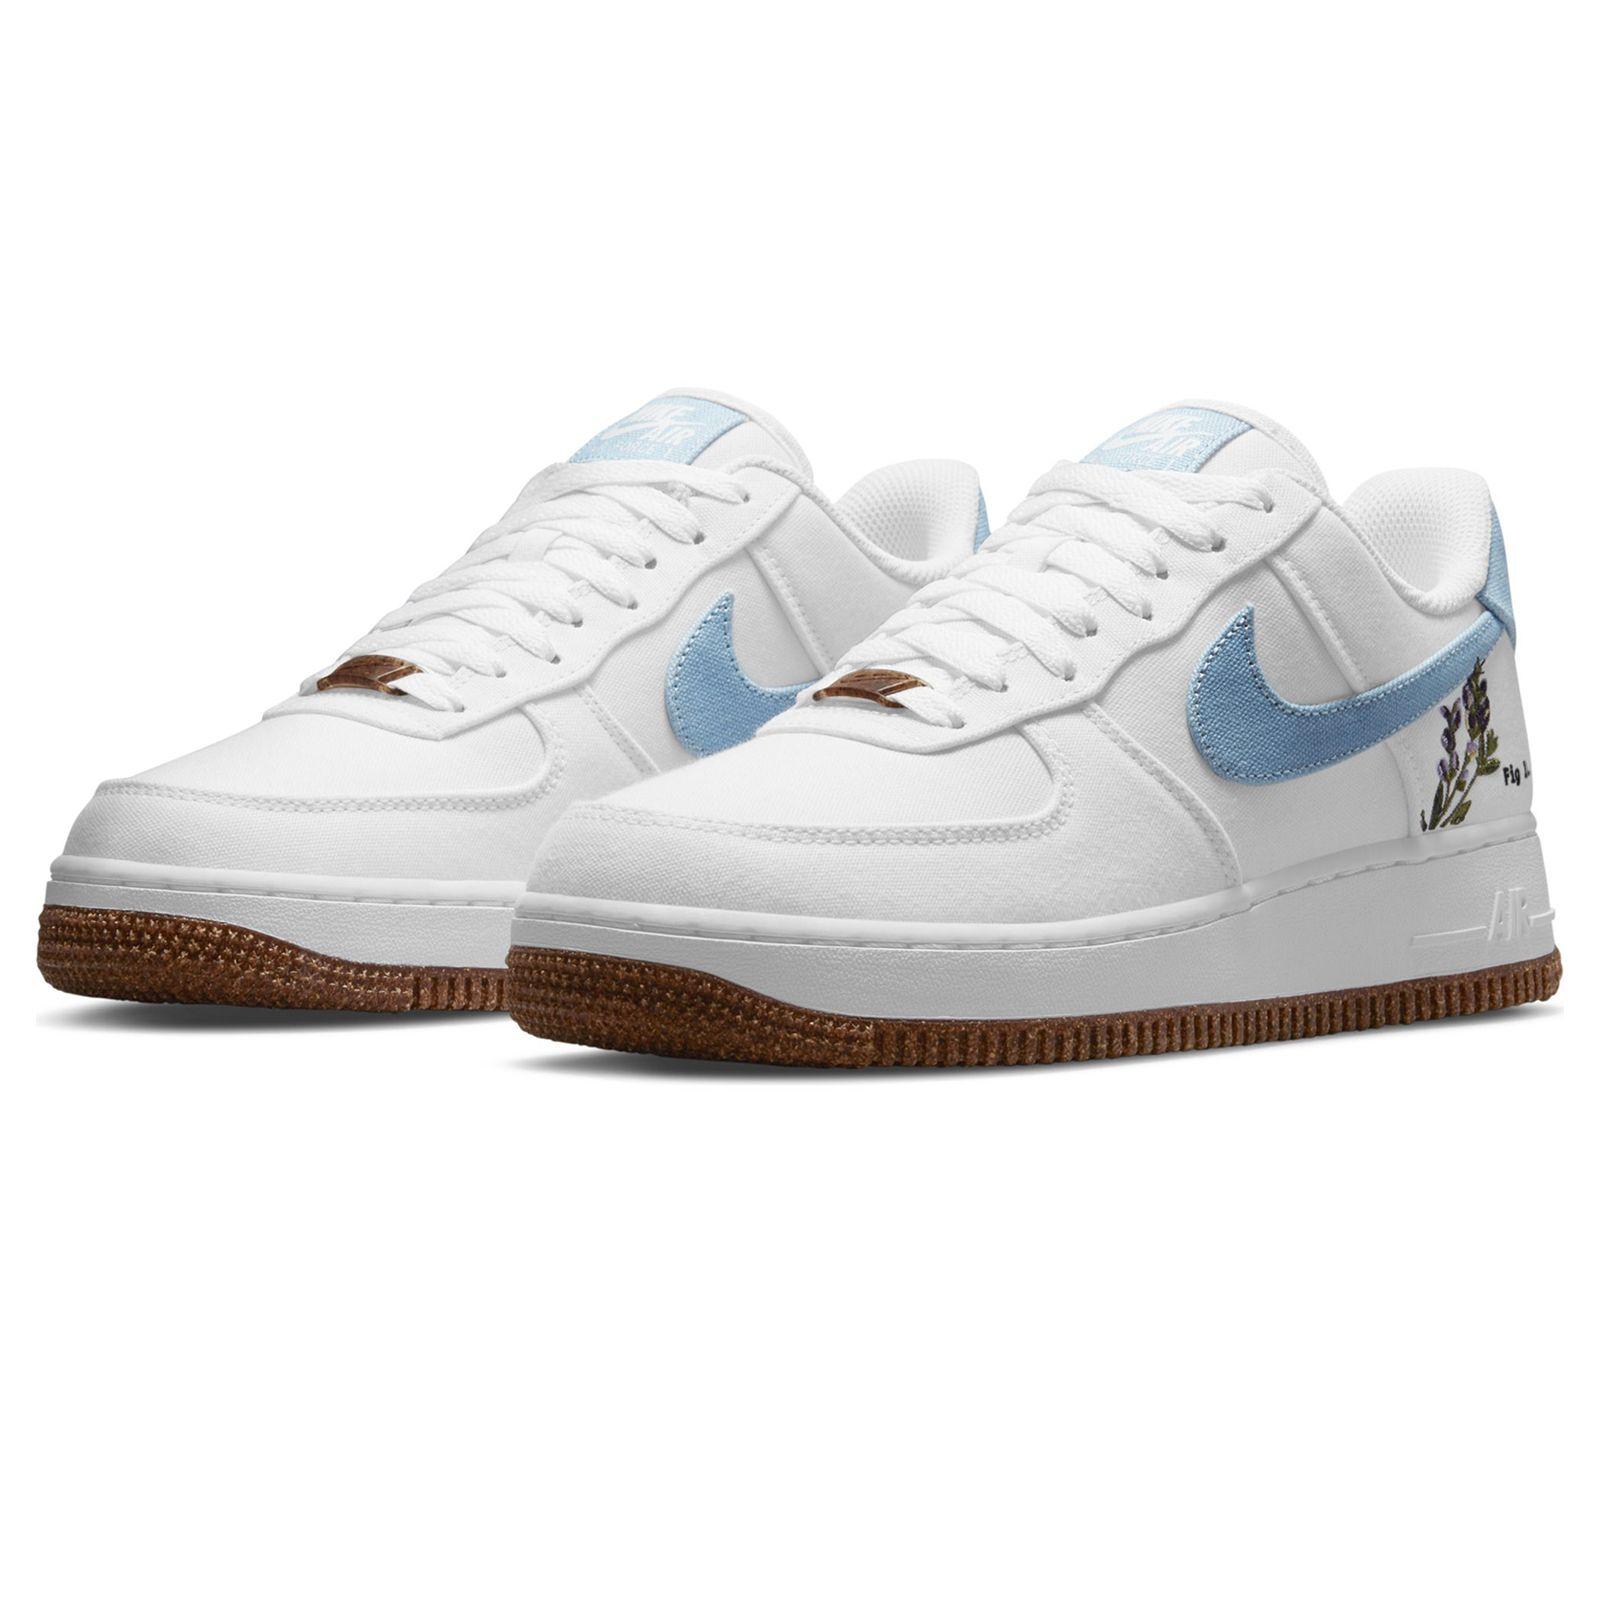 Nike Air Force 1 Wmns 1 07 SE